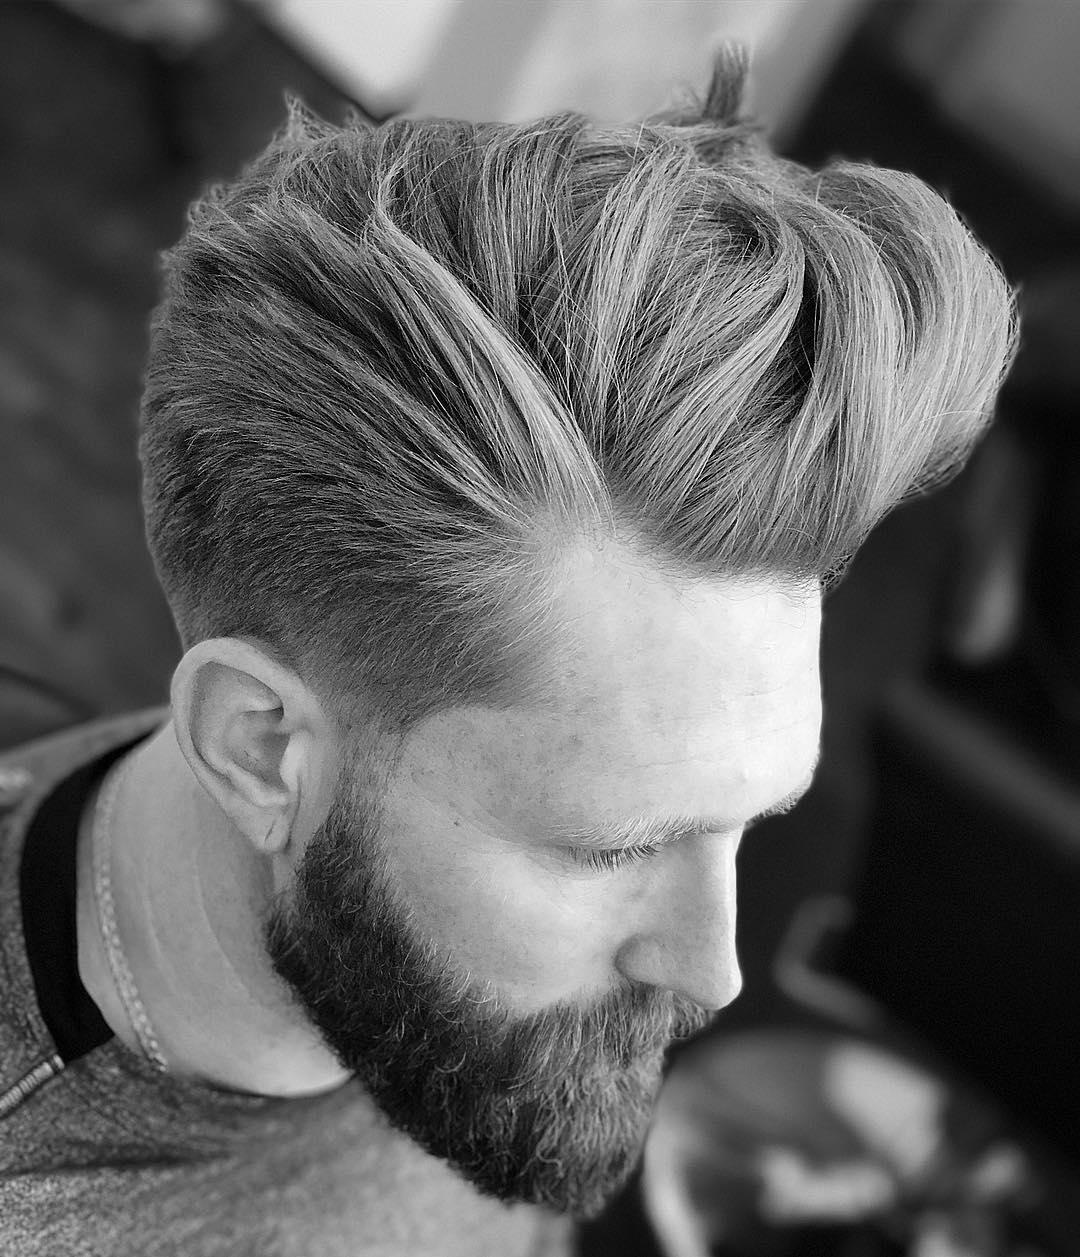 Trending Hairstyles For Men trending haircuts male trending haircuts for men blog hairstyles trending hairstyles for men Haircut By Dre Hair